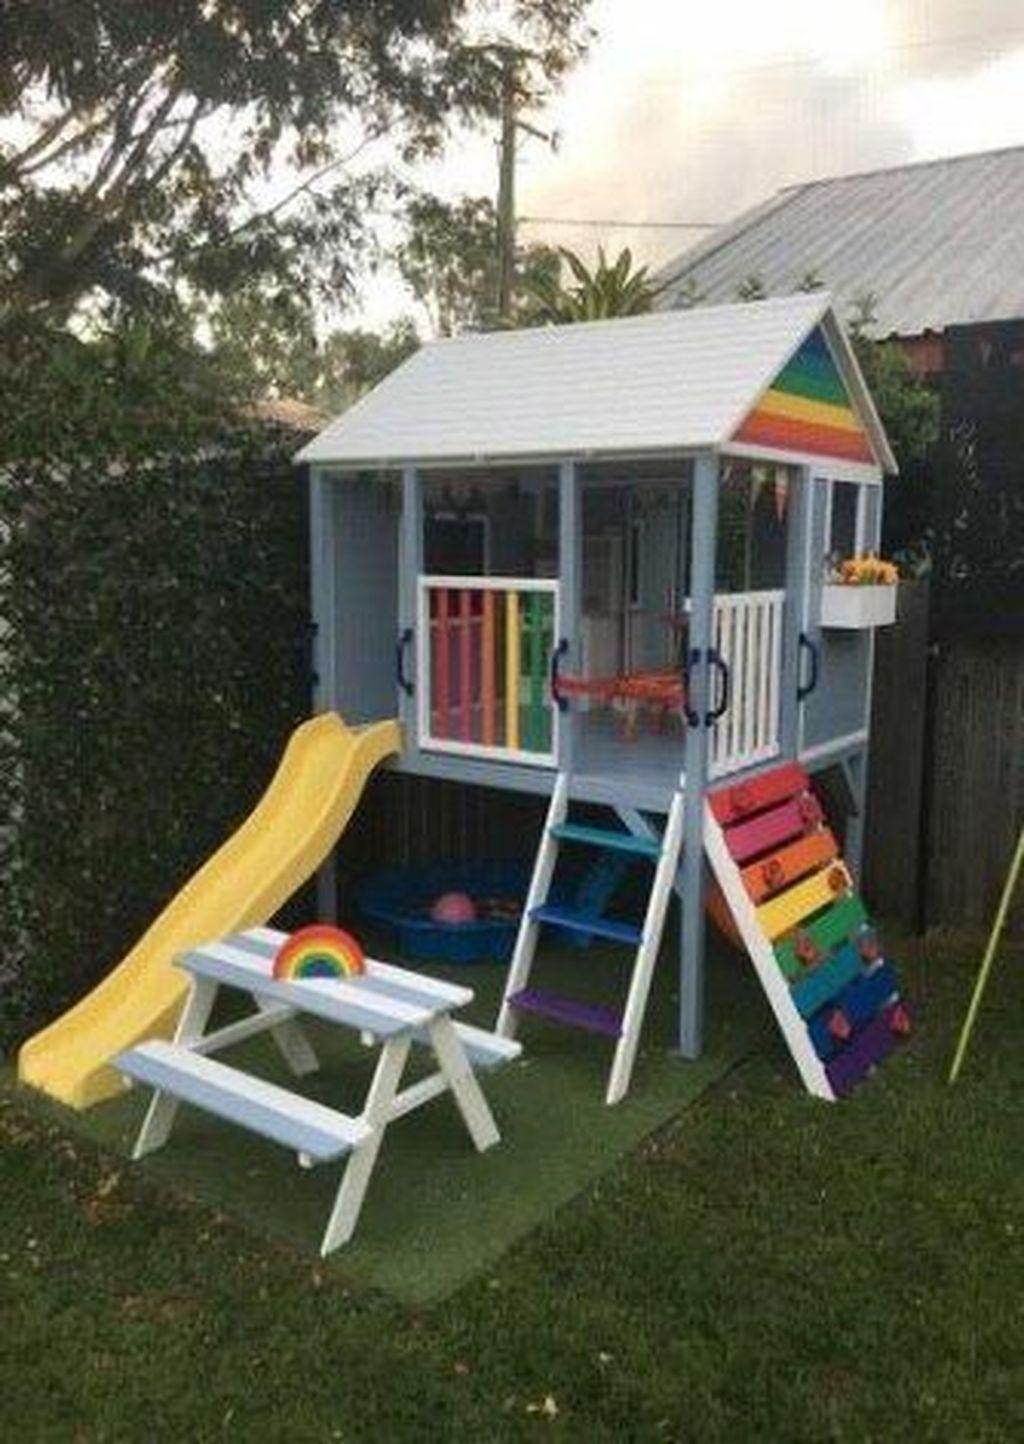 Maison Pour Enfant Exterieur 40+ astonishing backyard playground design ideas to try asap